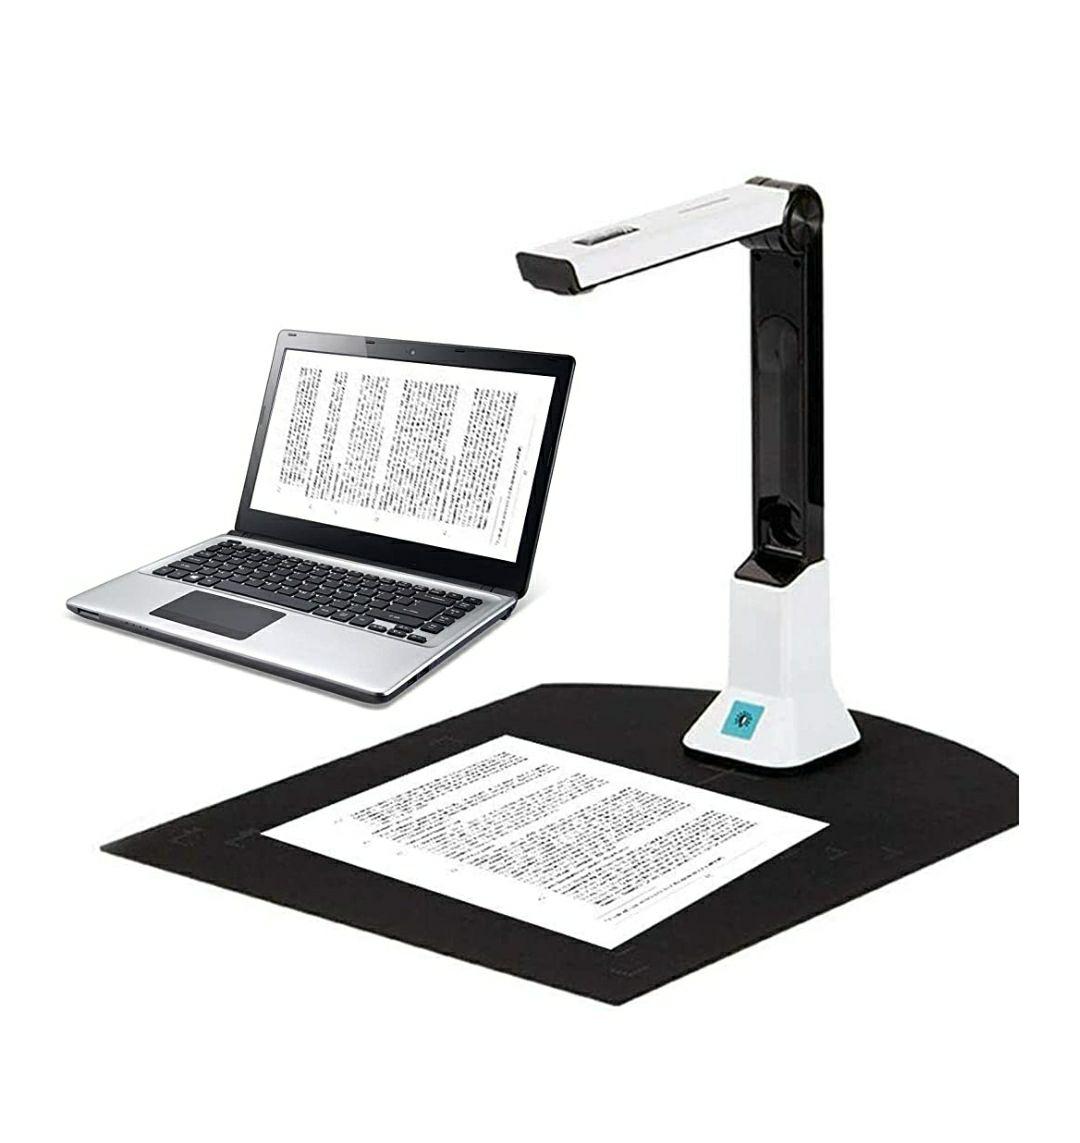 Kacsoo Document Camera Scanner